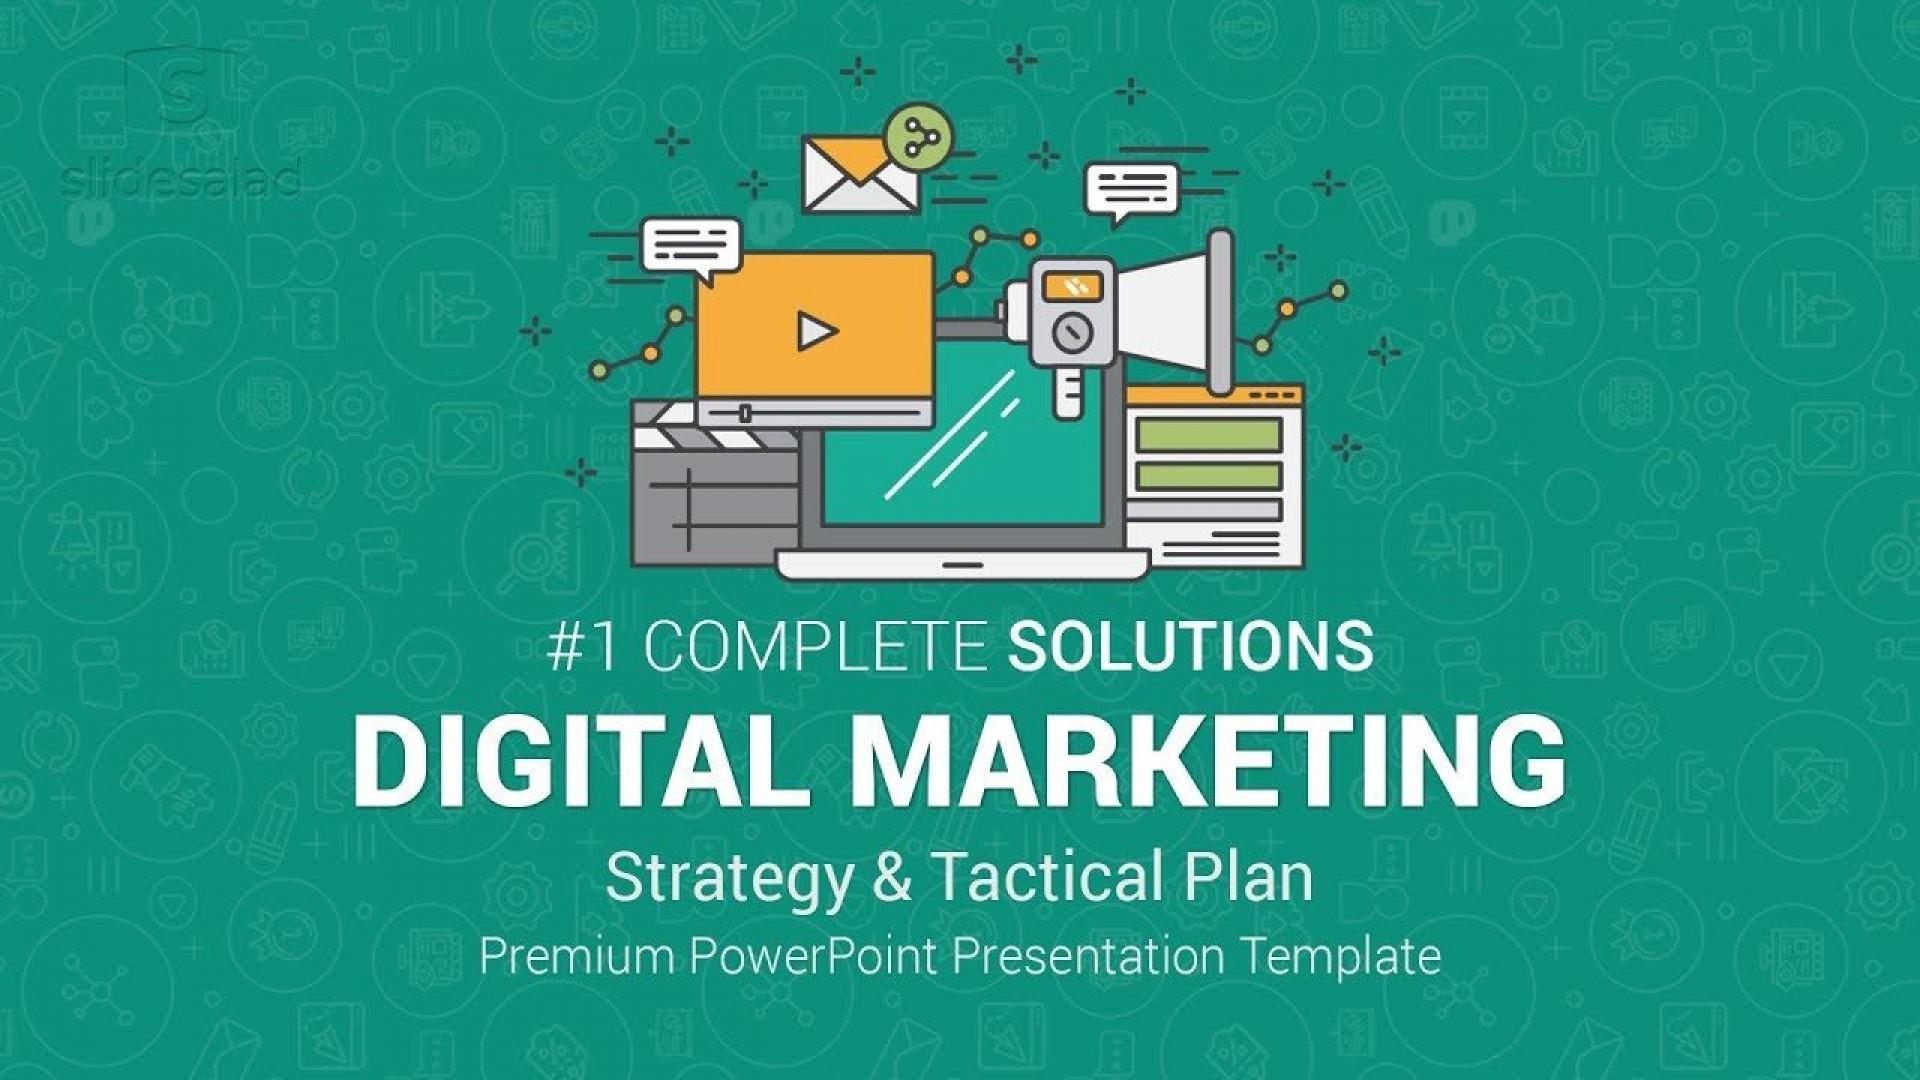 007 Stirring Digital Marketing Plan Template Ppt High Definition  Presentation Free Slideshare1920